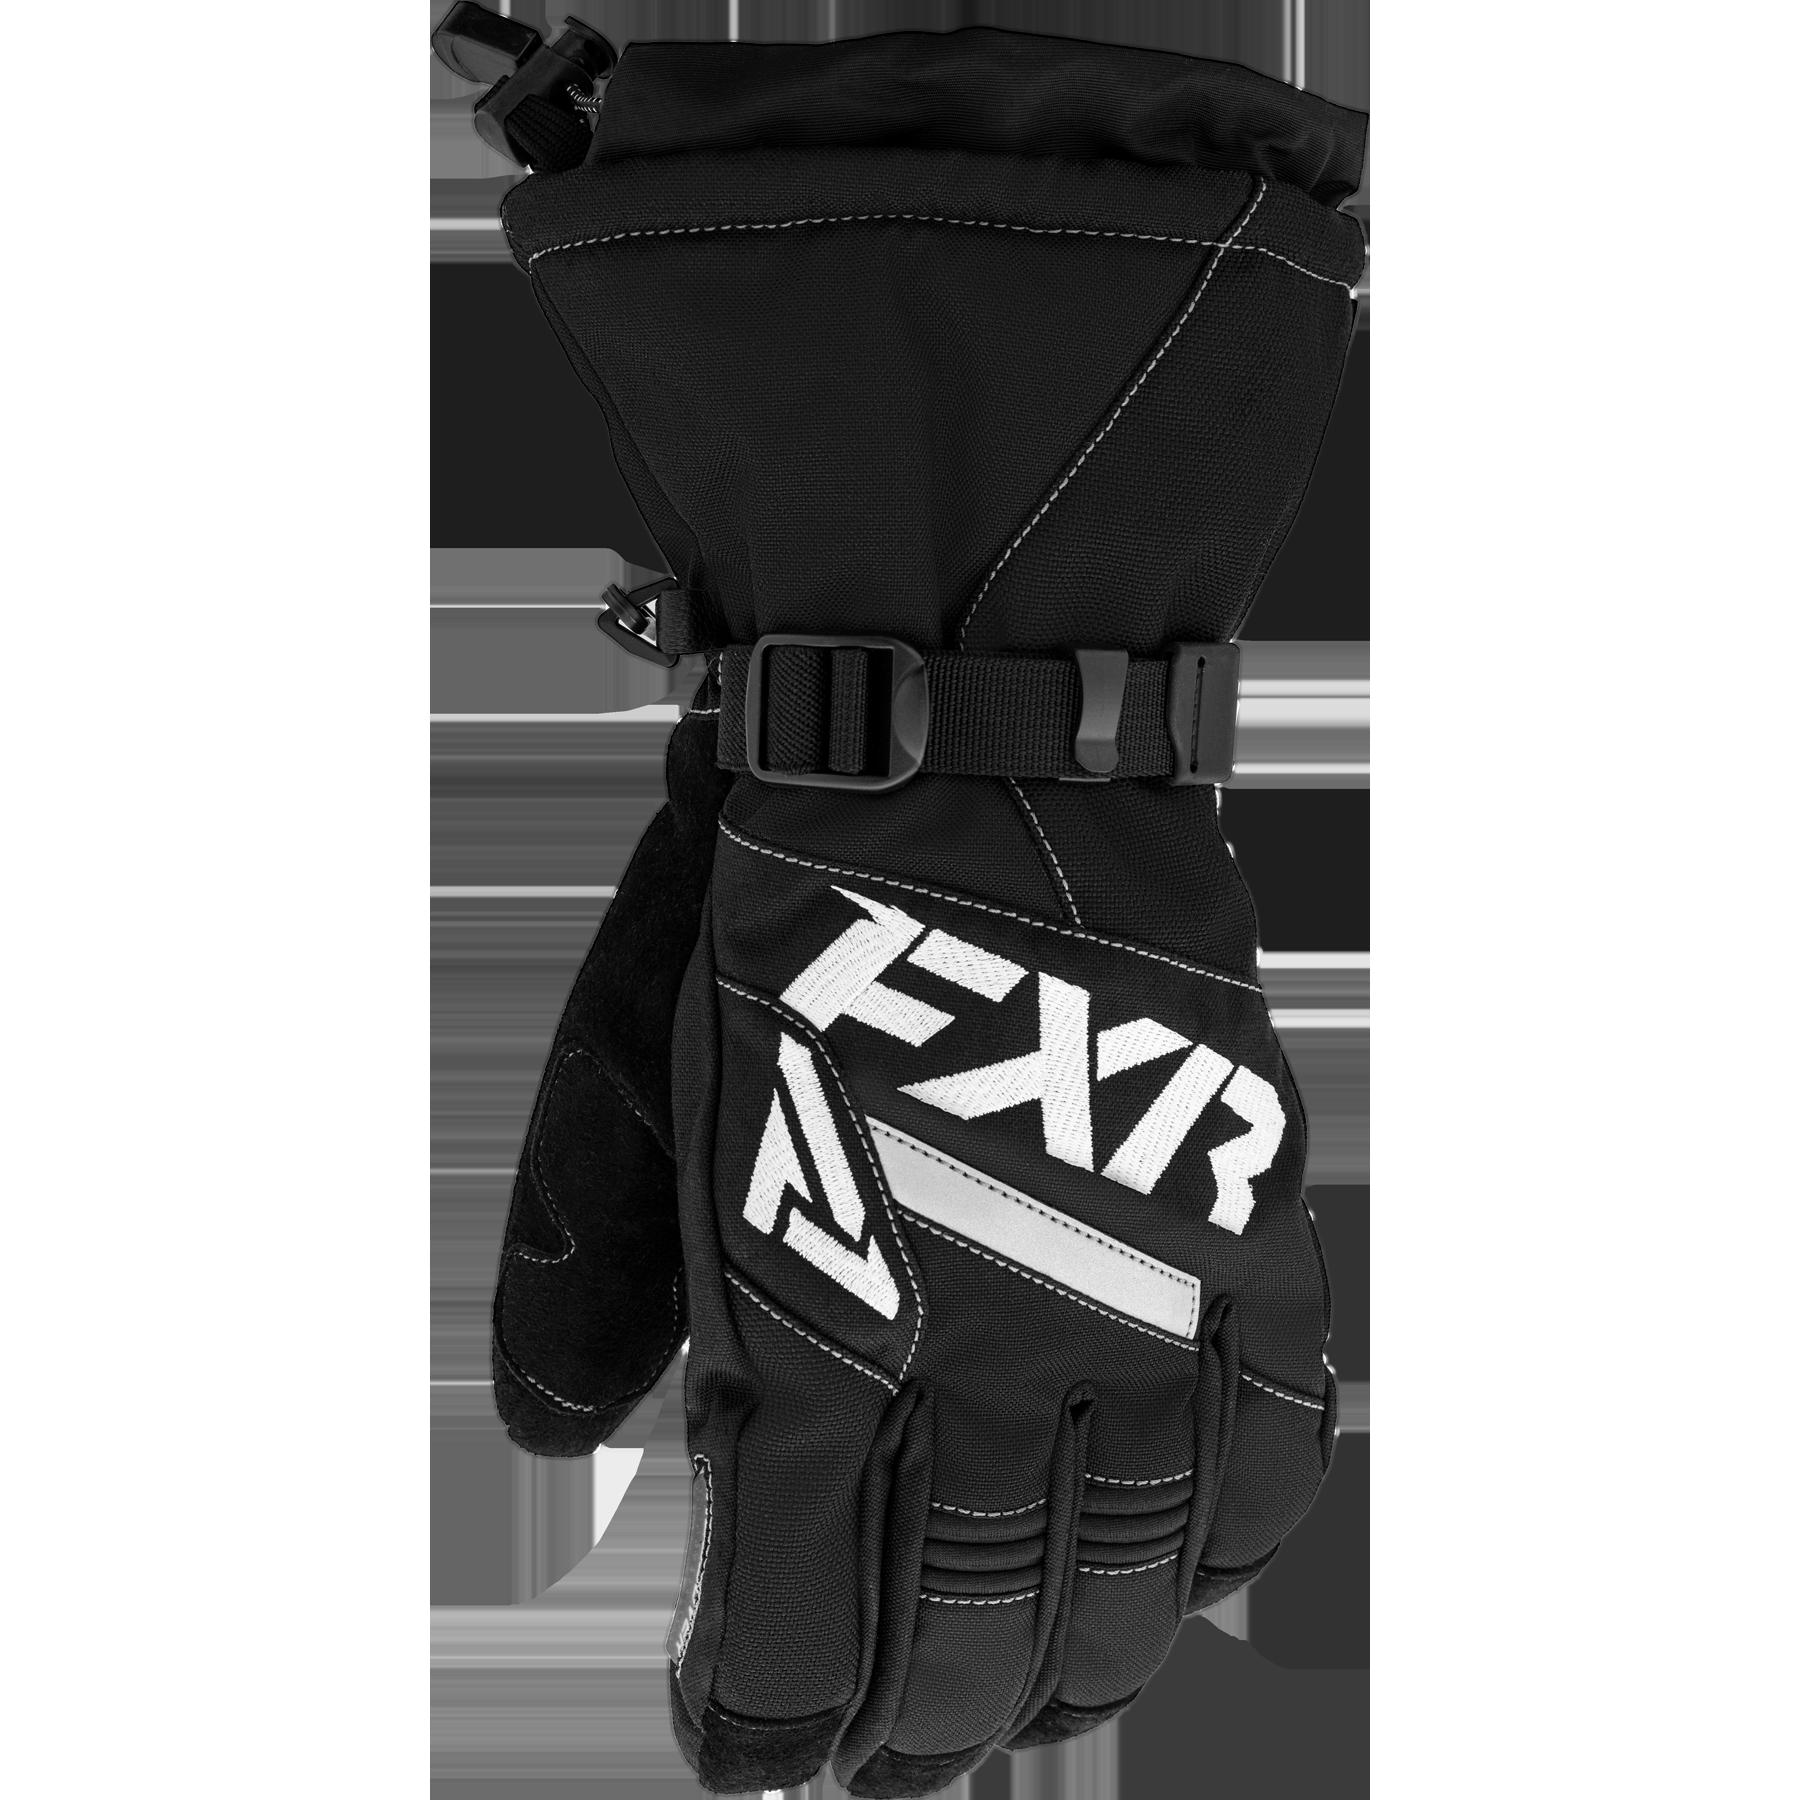 CX Glove 22 KI 7